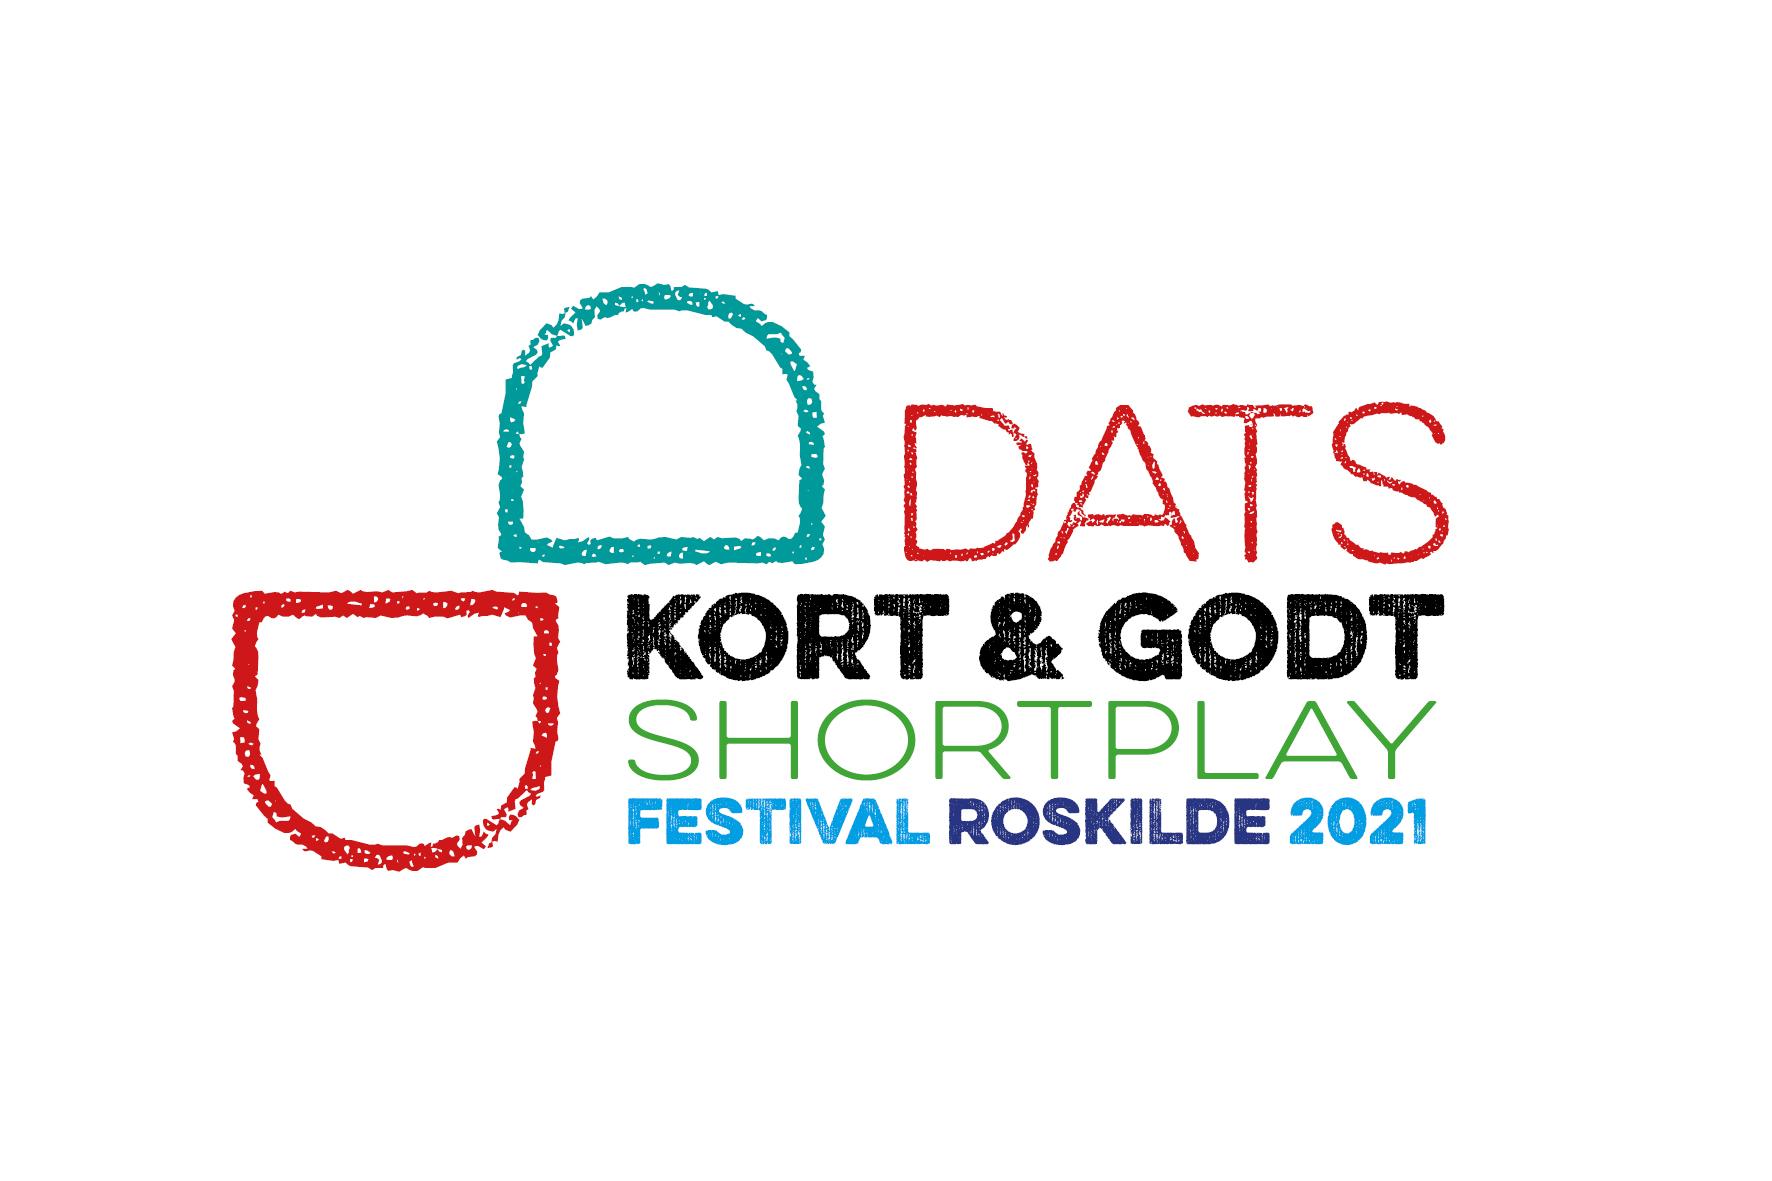 Shortplay Festival 2021_Kort & Godt_version 02_17.11.20